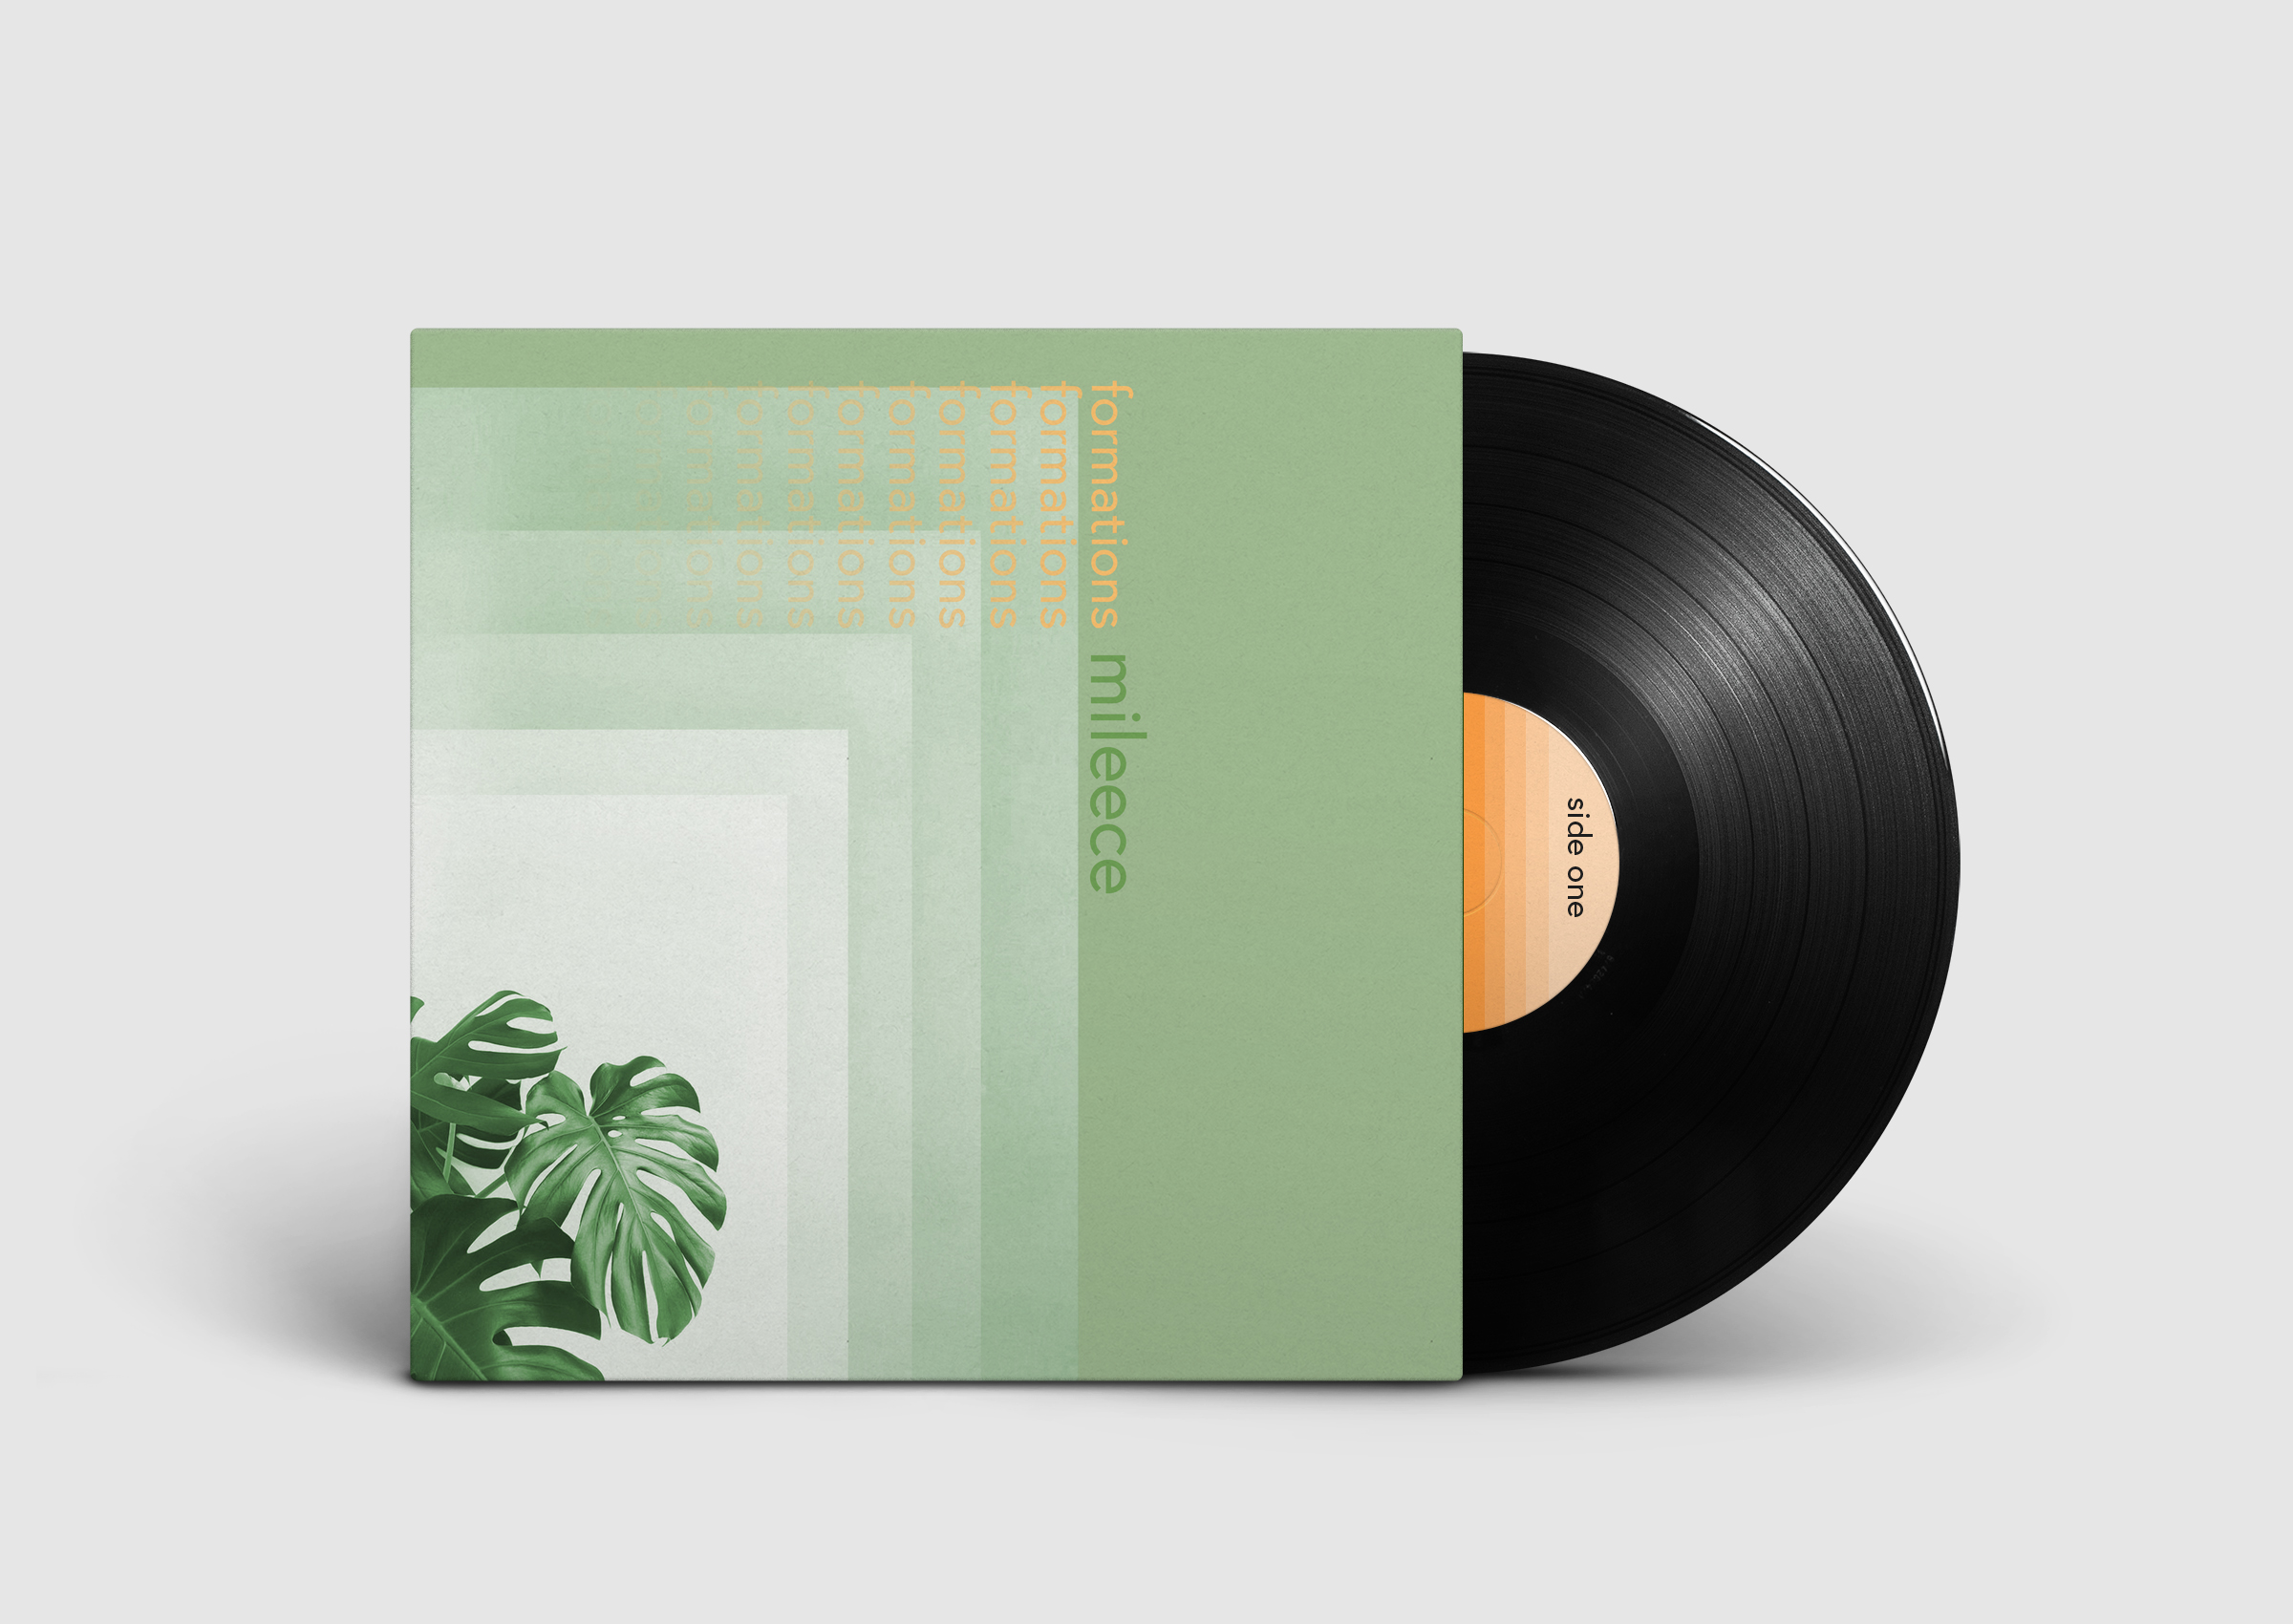 vinyl_album_cover.jpg